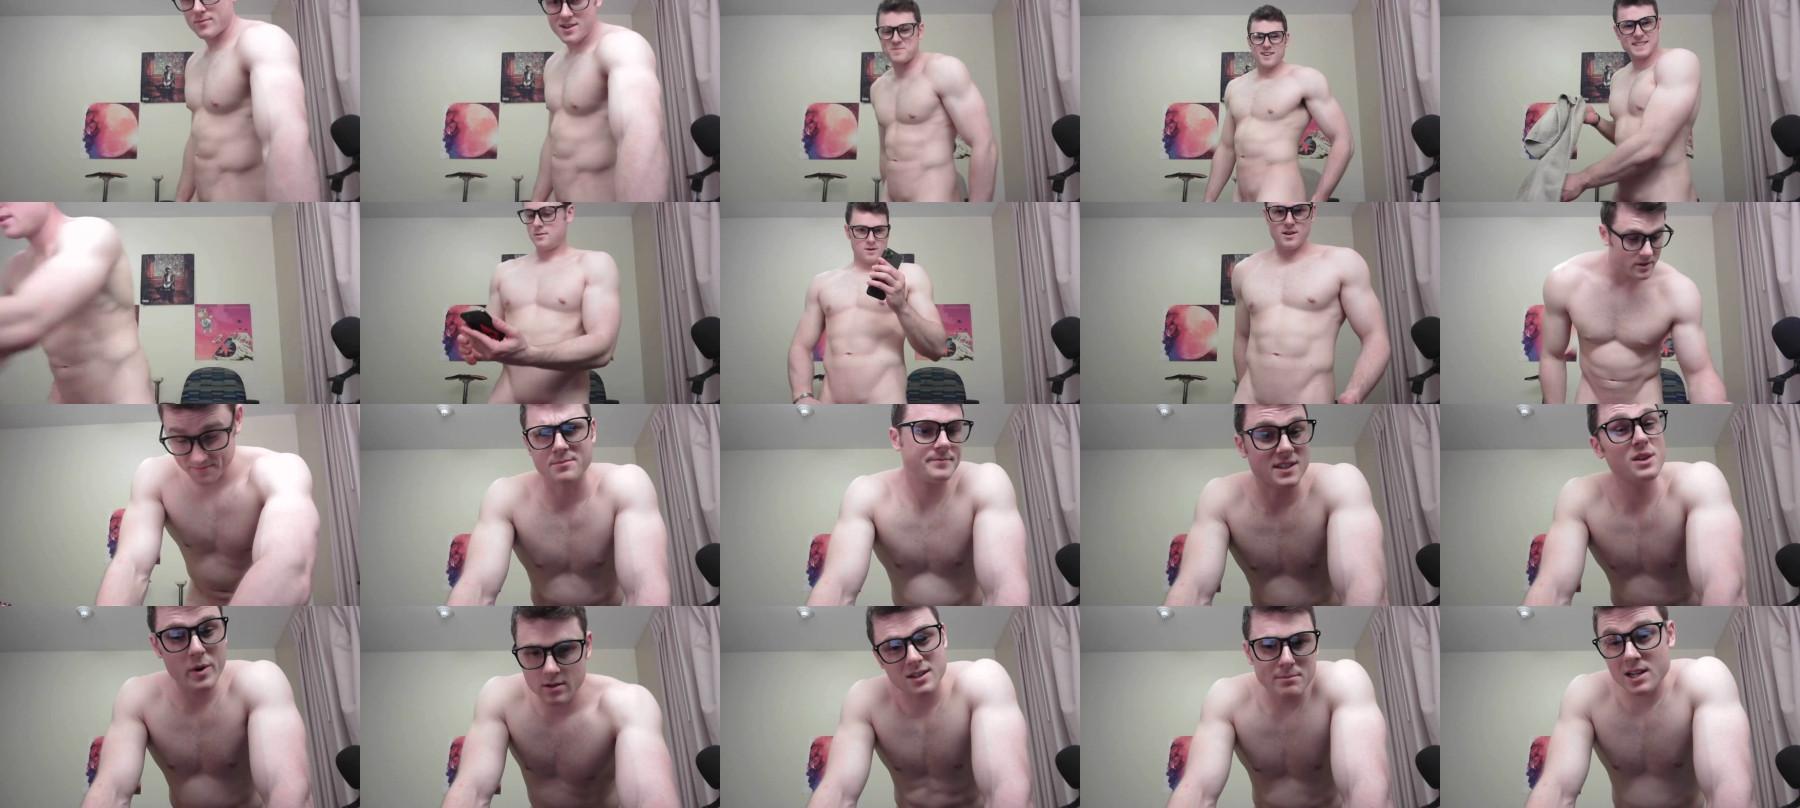 Duke_Bronson Chaturbate 04-05-2021 Male Video